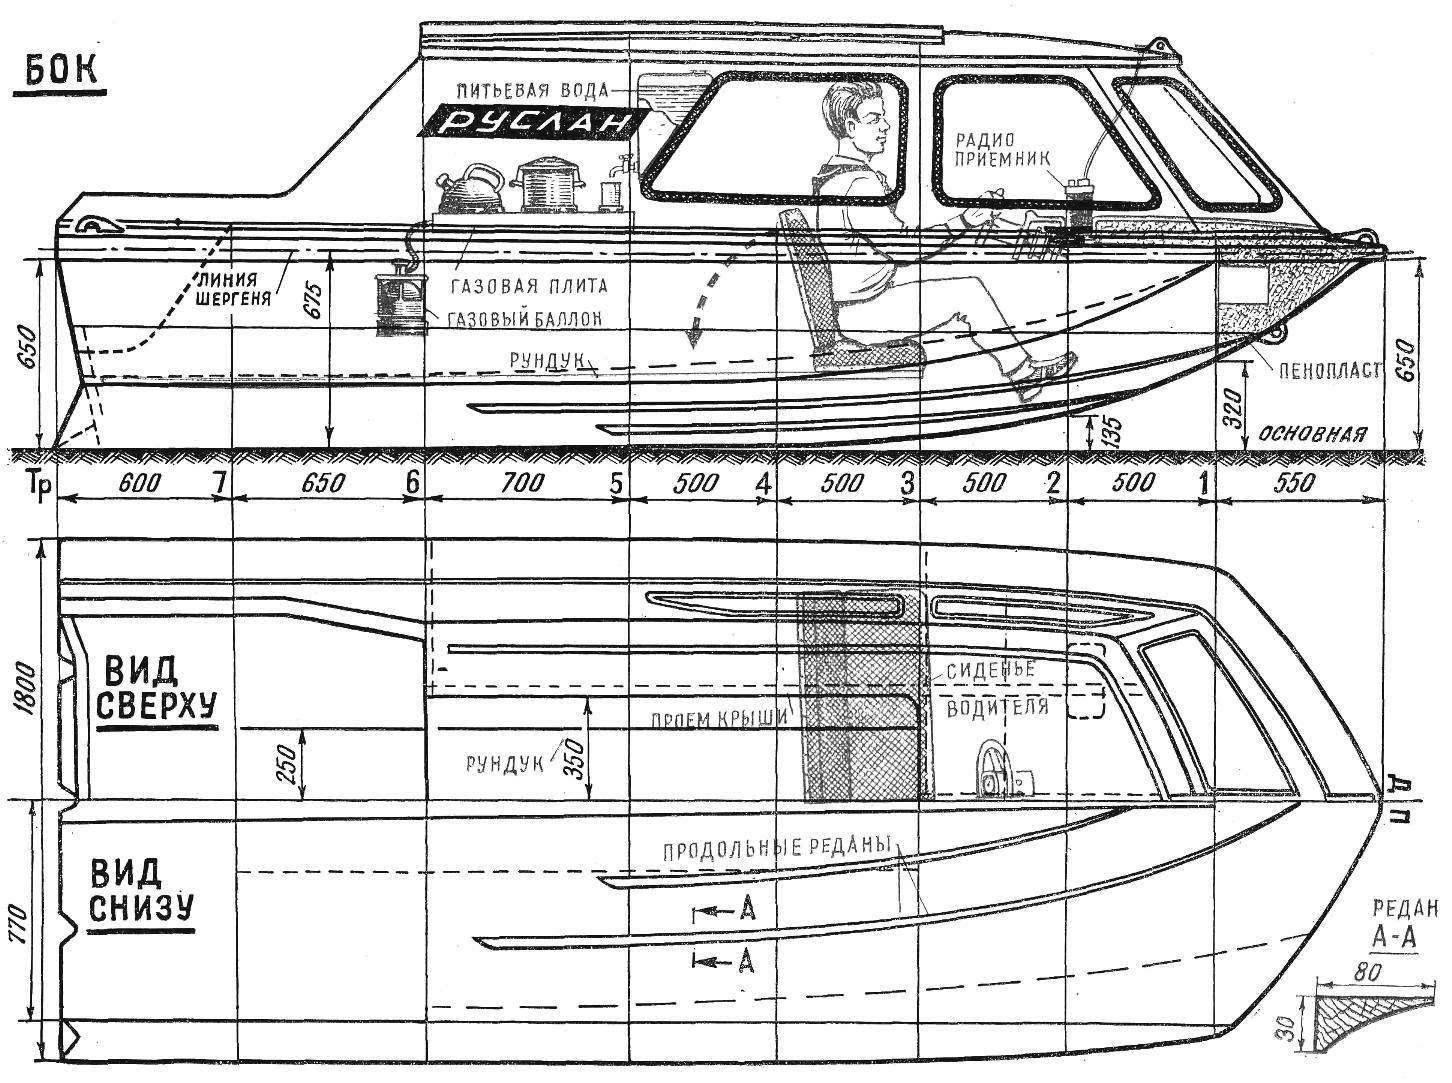 Fig. 4. Cabin boat